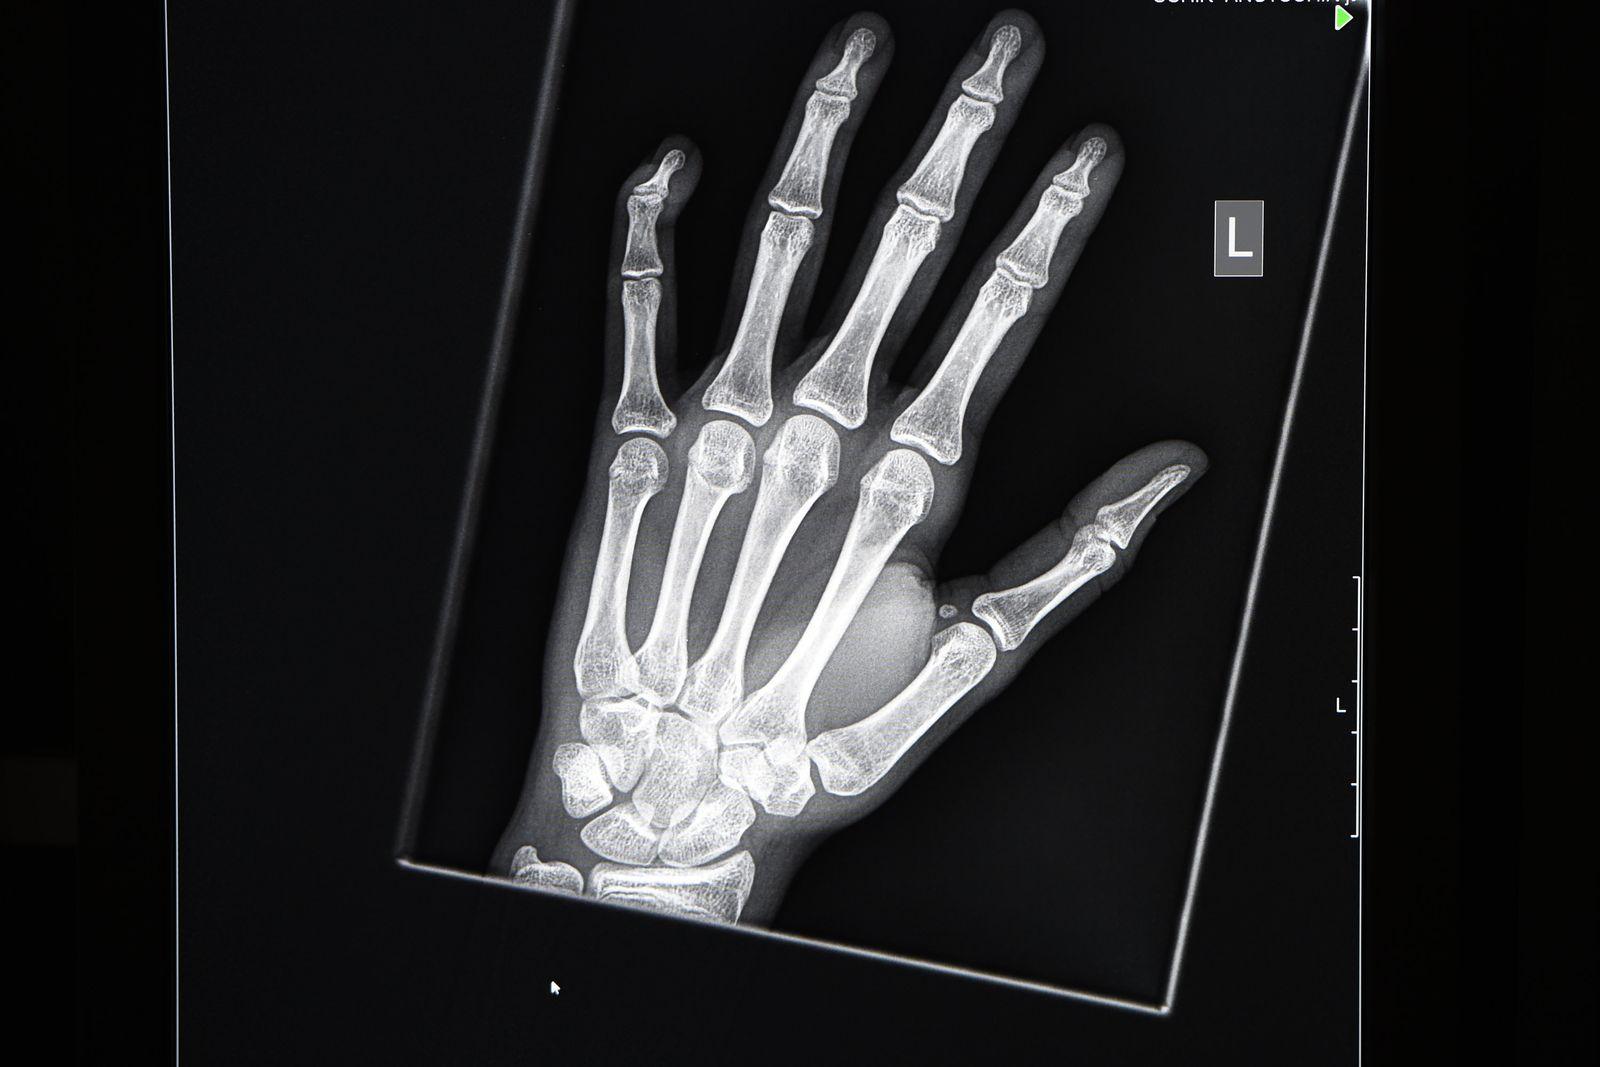 Röntgenbild/ Flüchtlinge/ Altersbestimmung